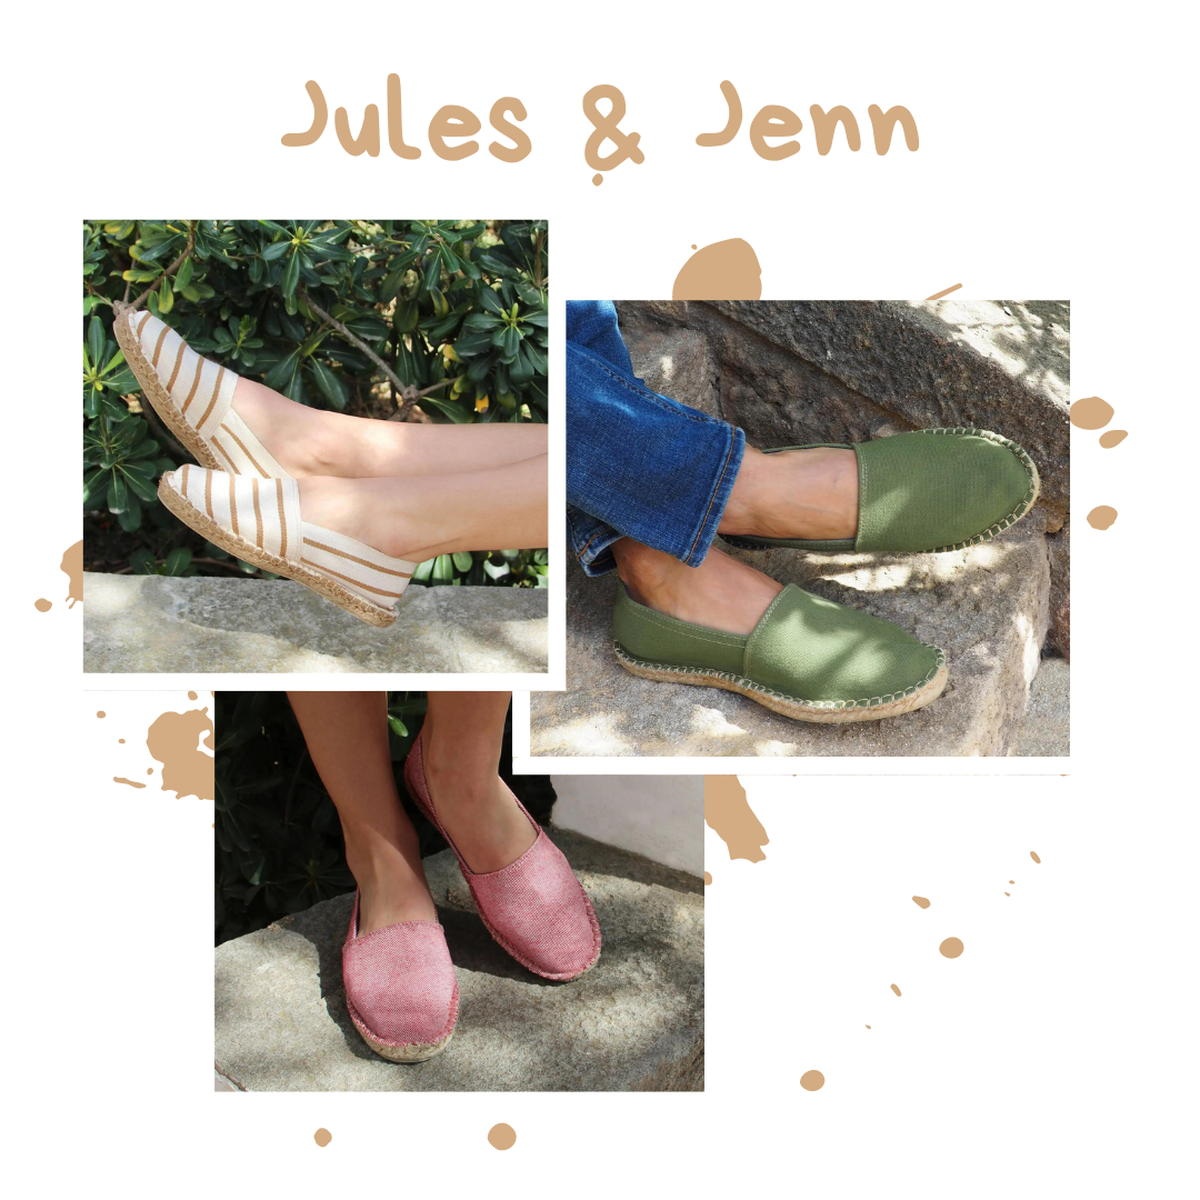 Jules Jenn - Espadrilles - rayures - coton - recyclé - semelle gomme - mixte - homme -femme - made in France